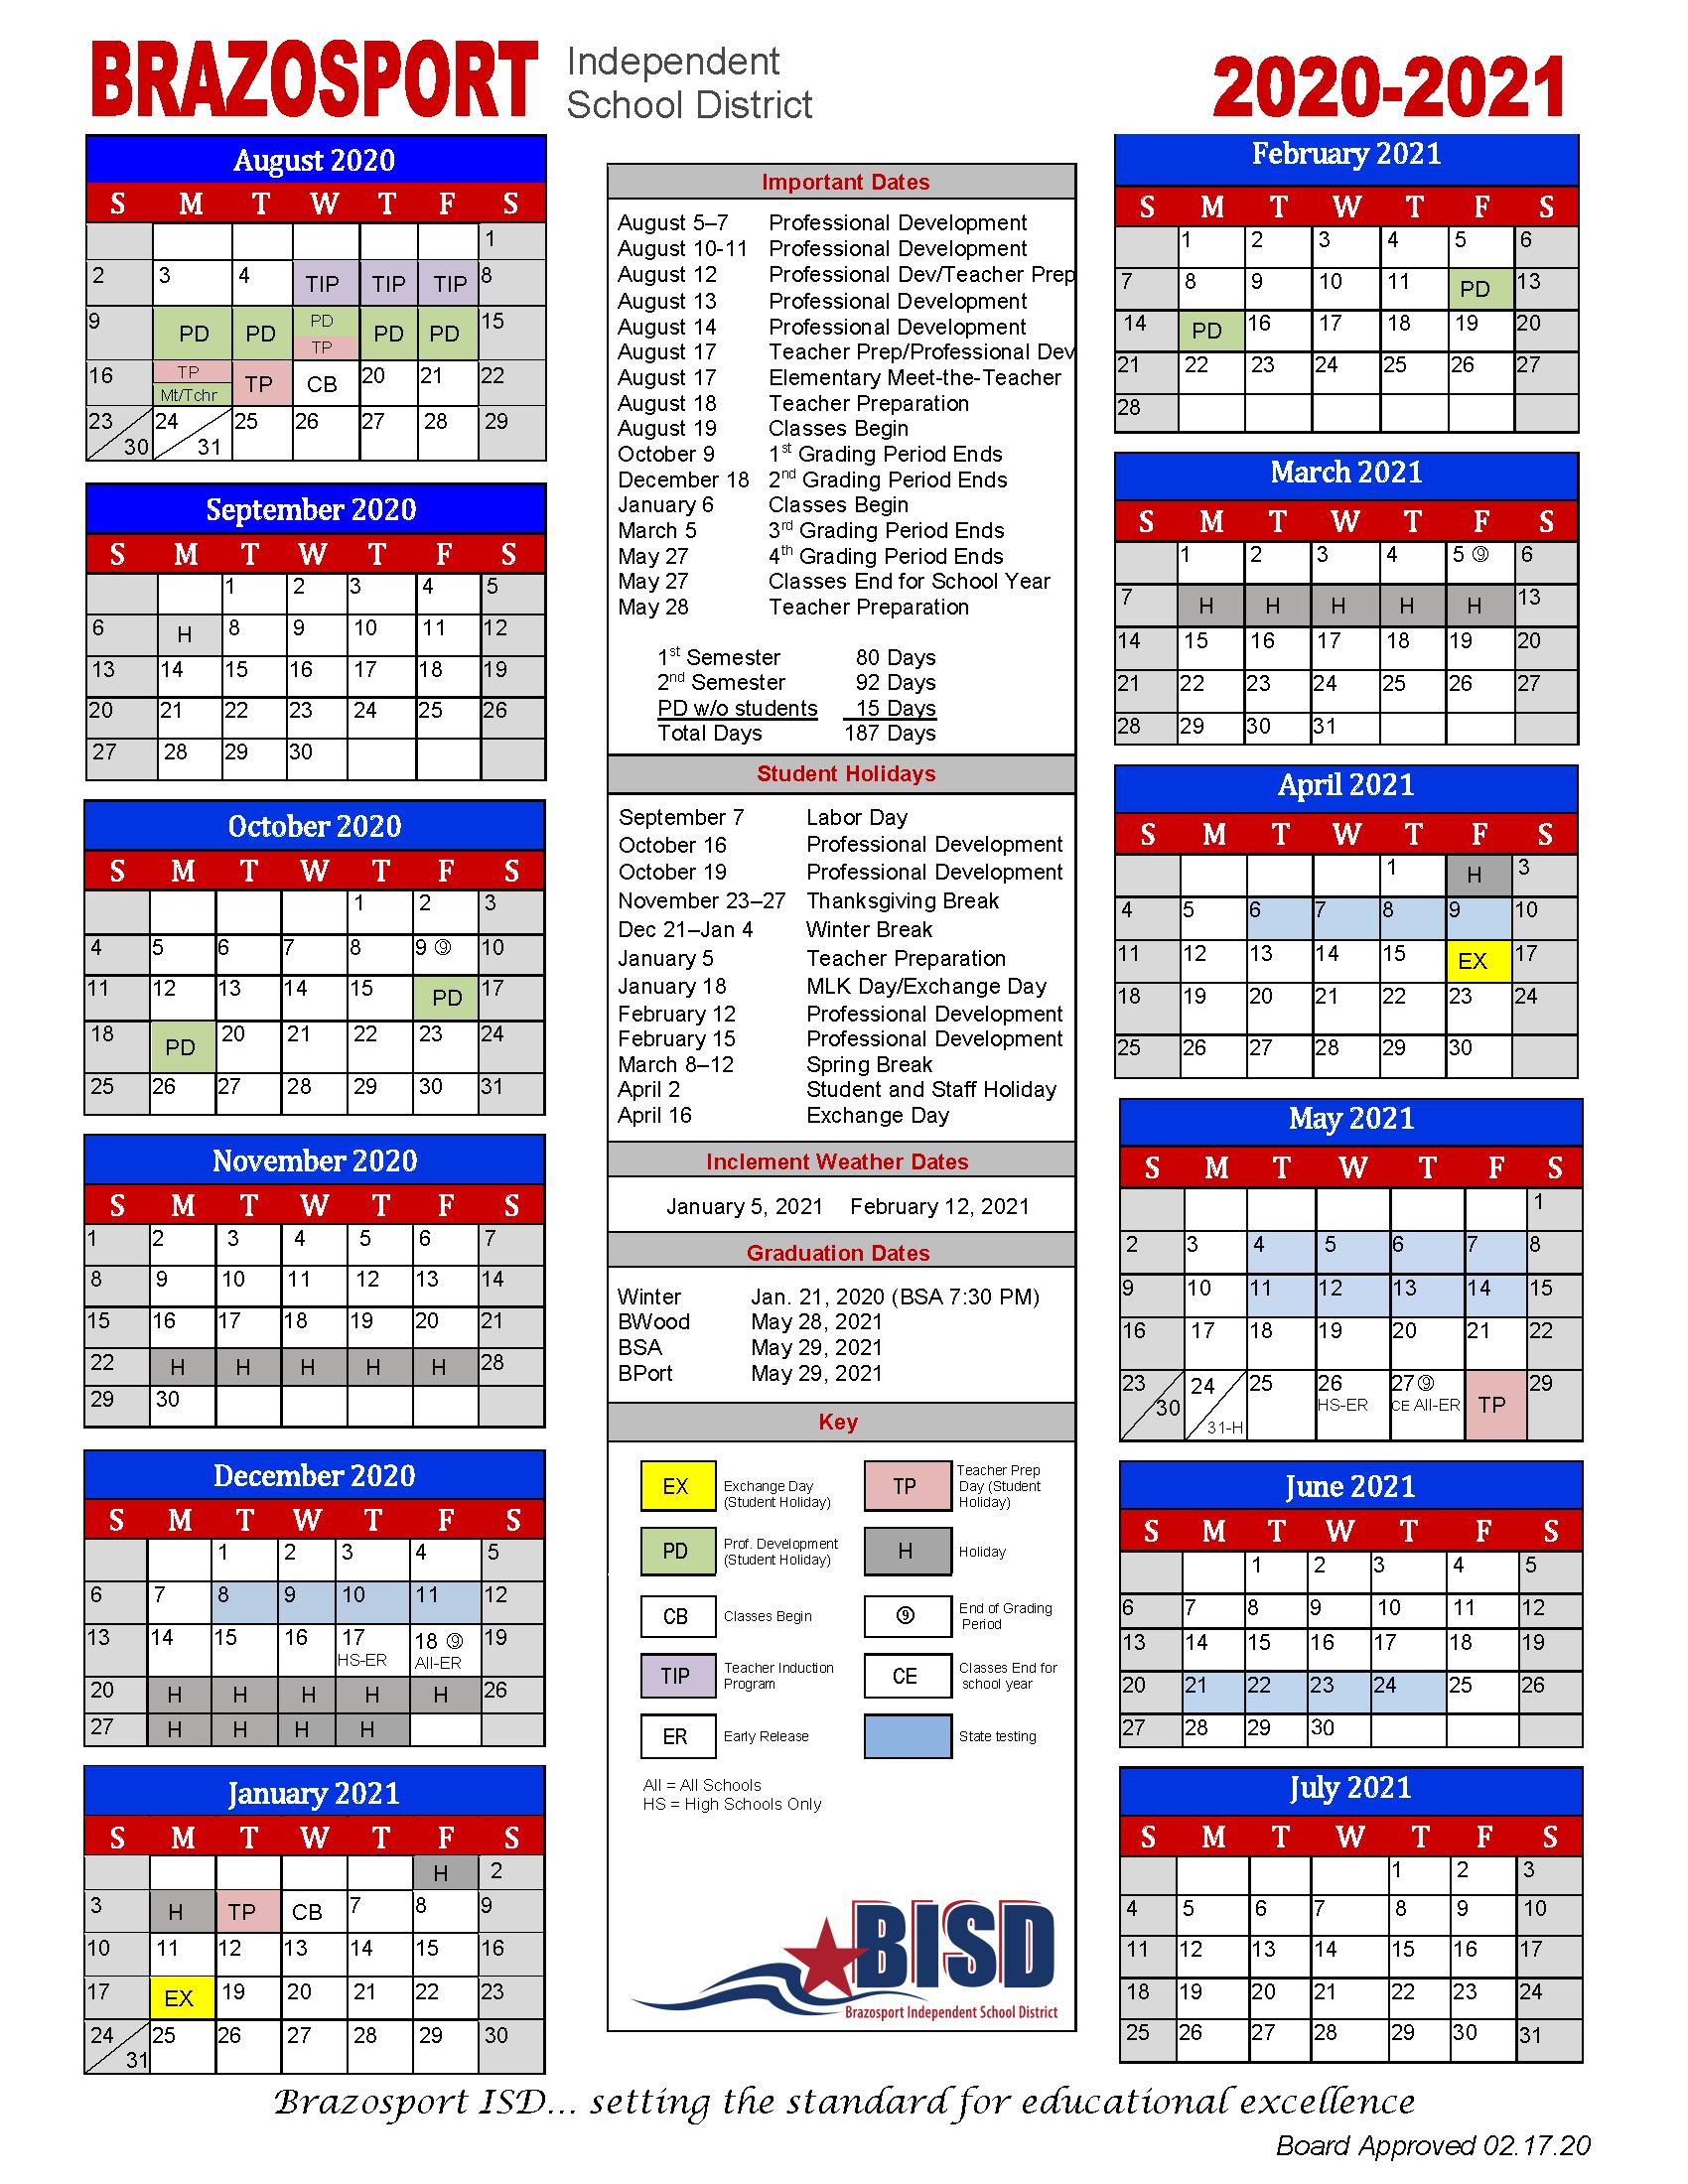 Brownsville Independent School District Calendar Within Wilkes Barre Area School District Calander 2021